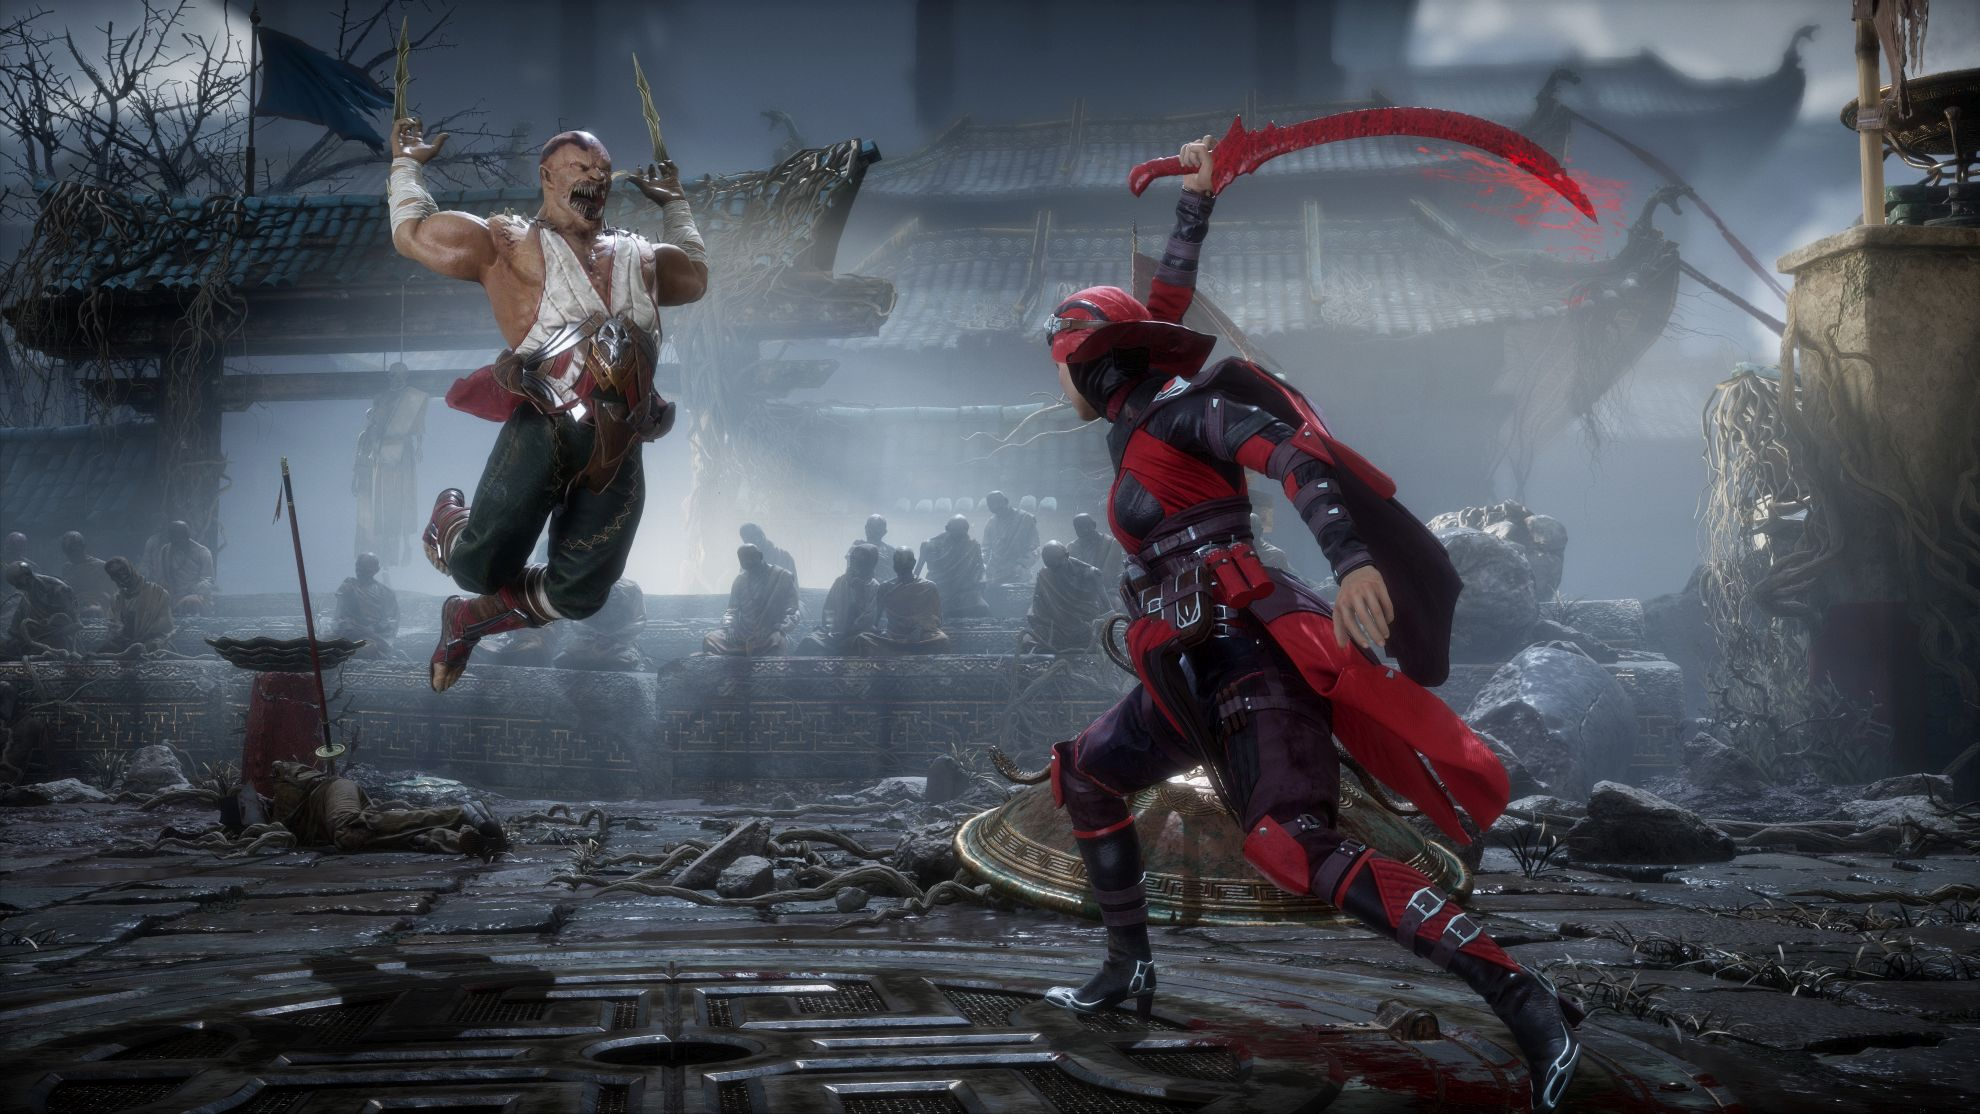 Mortal kombat 11 all the new story gameplay and - Mortal kombat 11 wallpaper ...